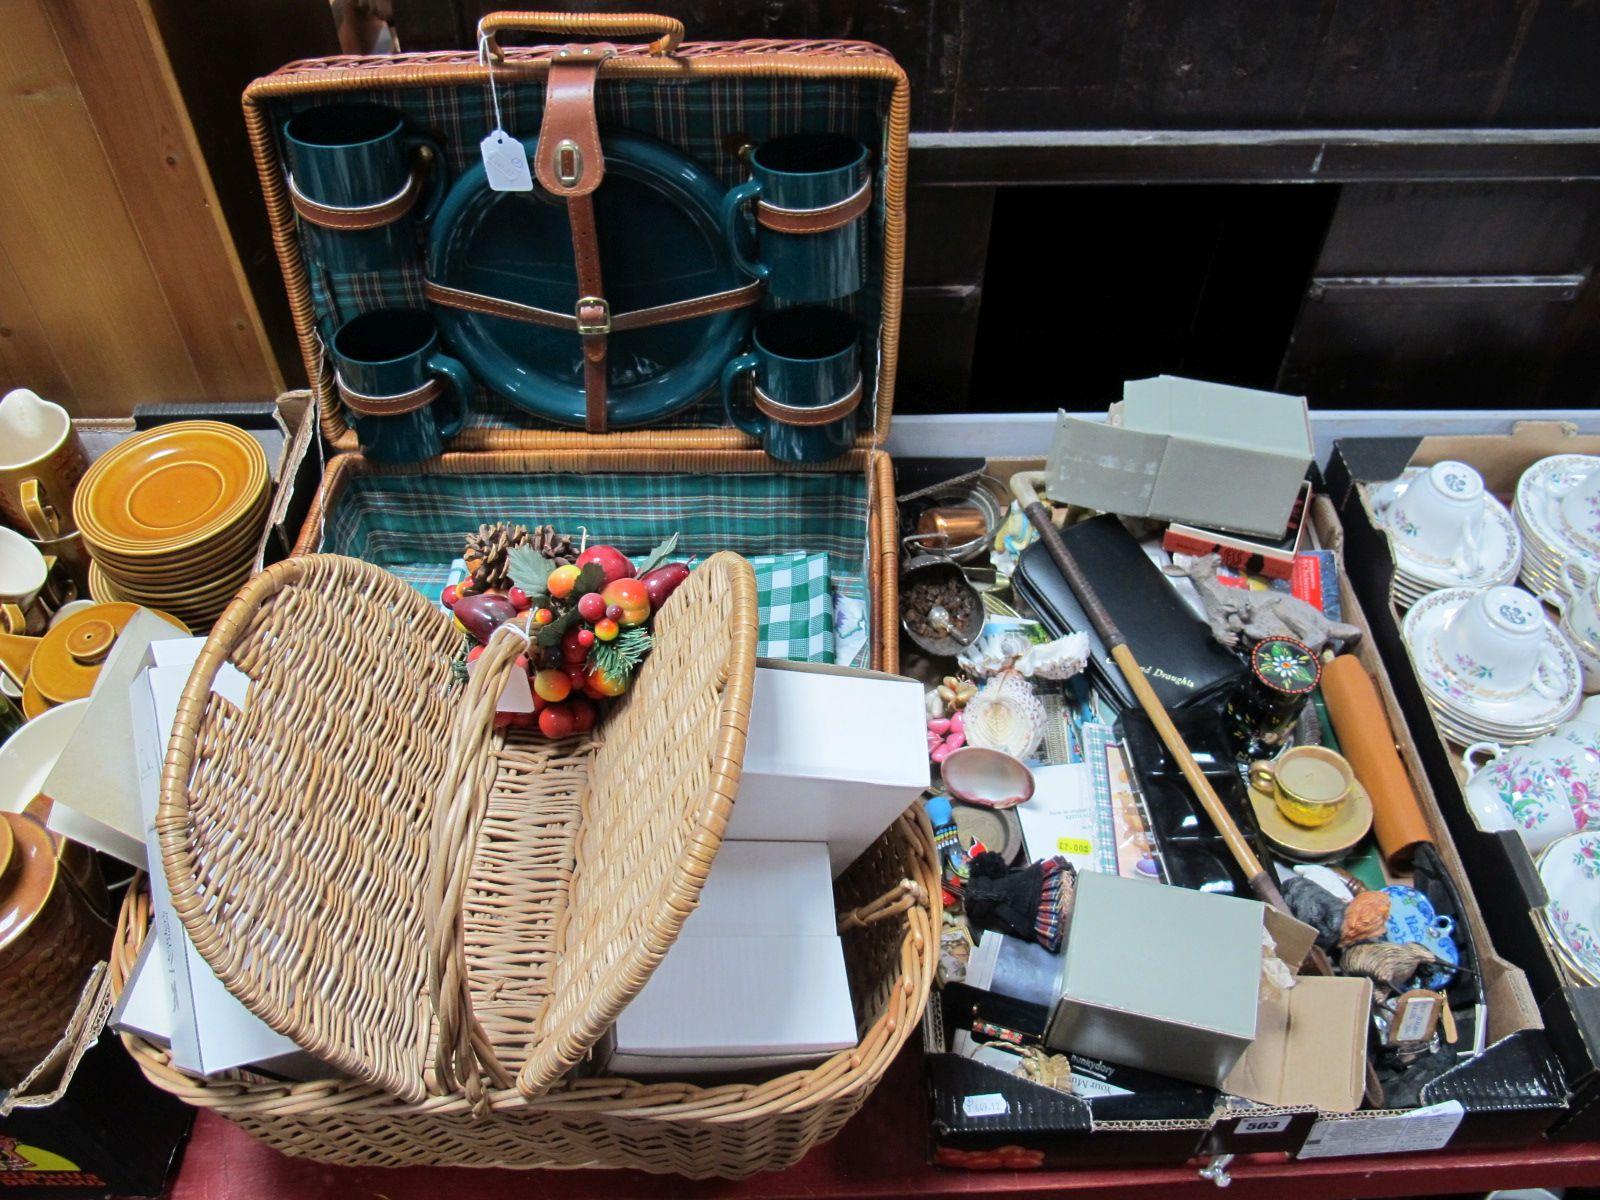 Lot 503 - A Wicker Picnic Hamper, riding crop, watercolour paints, souvenir teaspoons, travel games and